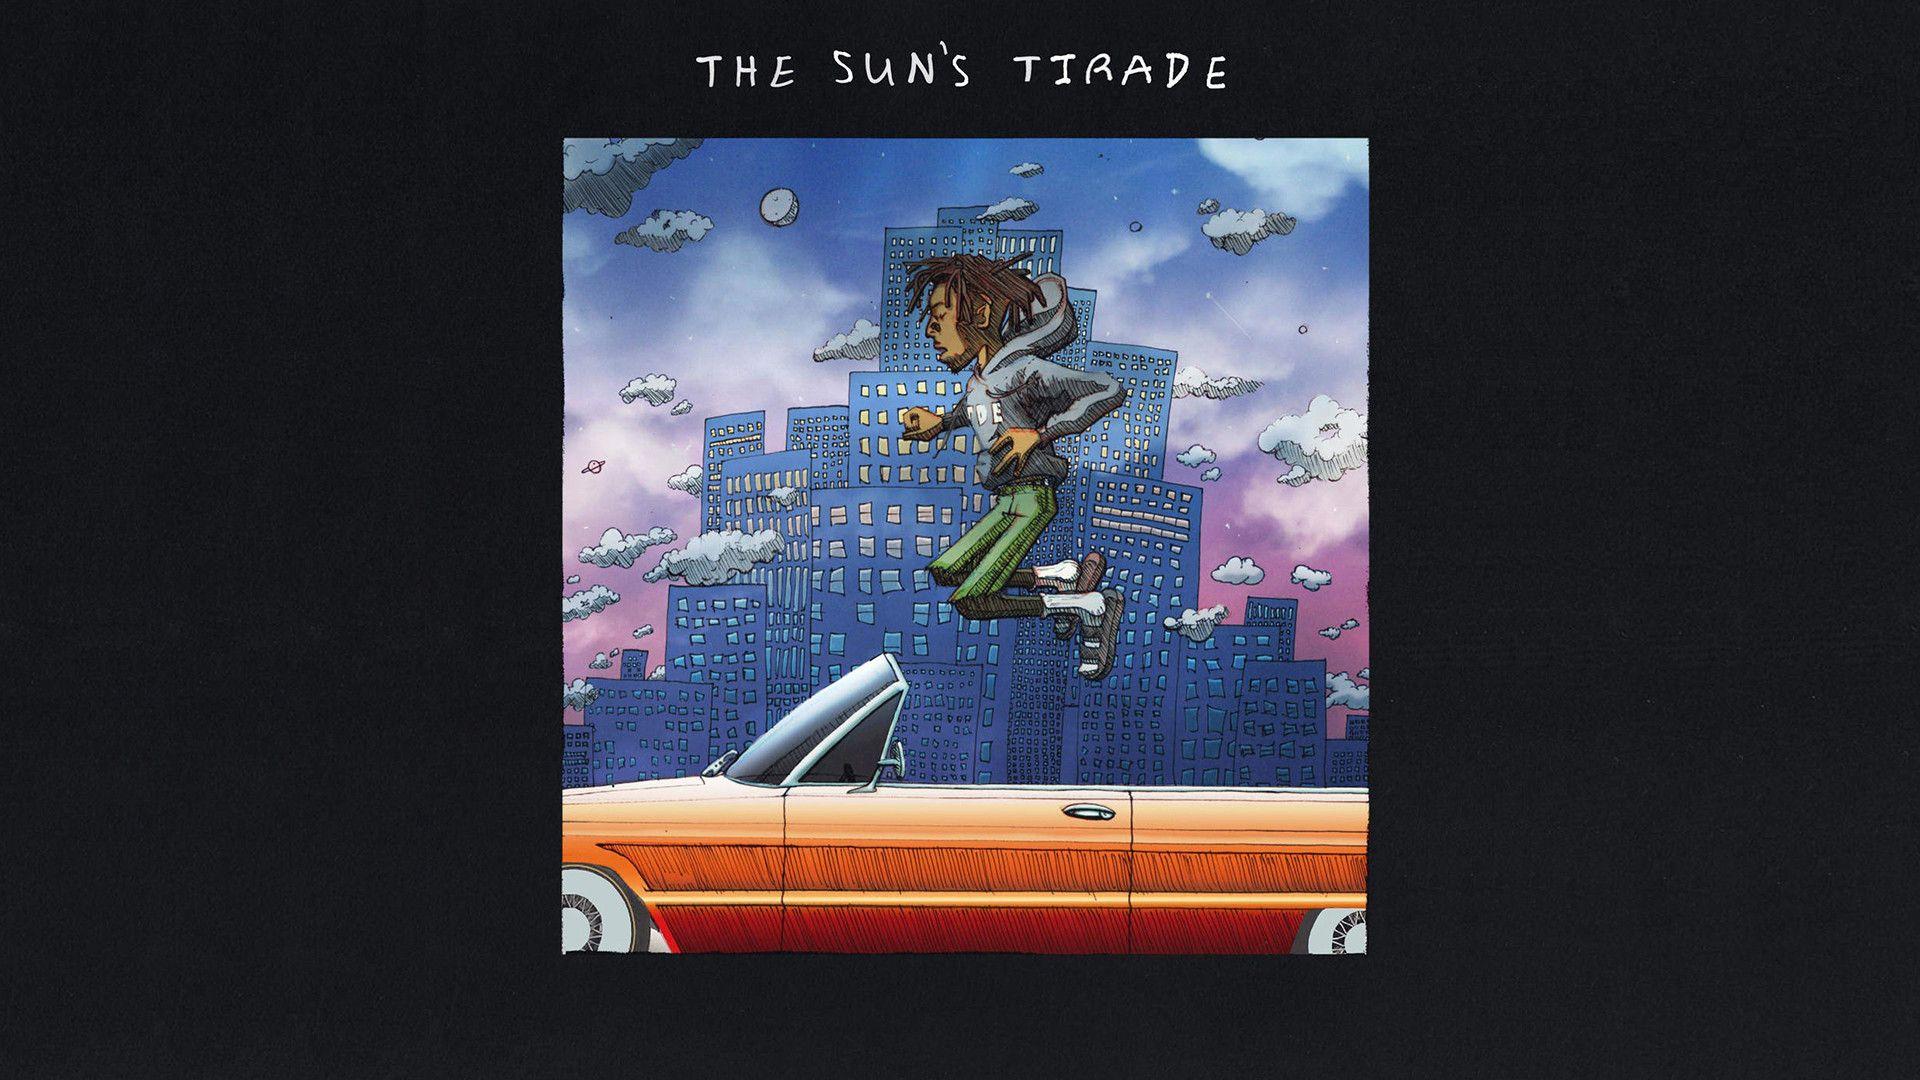 The Suns Tirade Isaiah Rashad [1920x1080] Hd wallpaper High 1920x1080